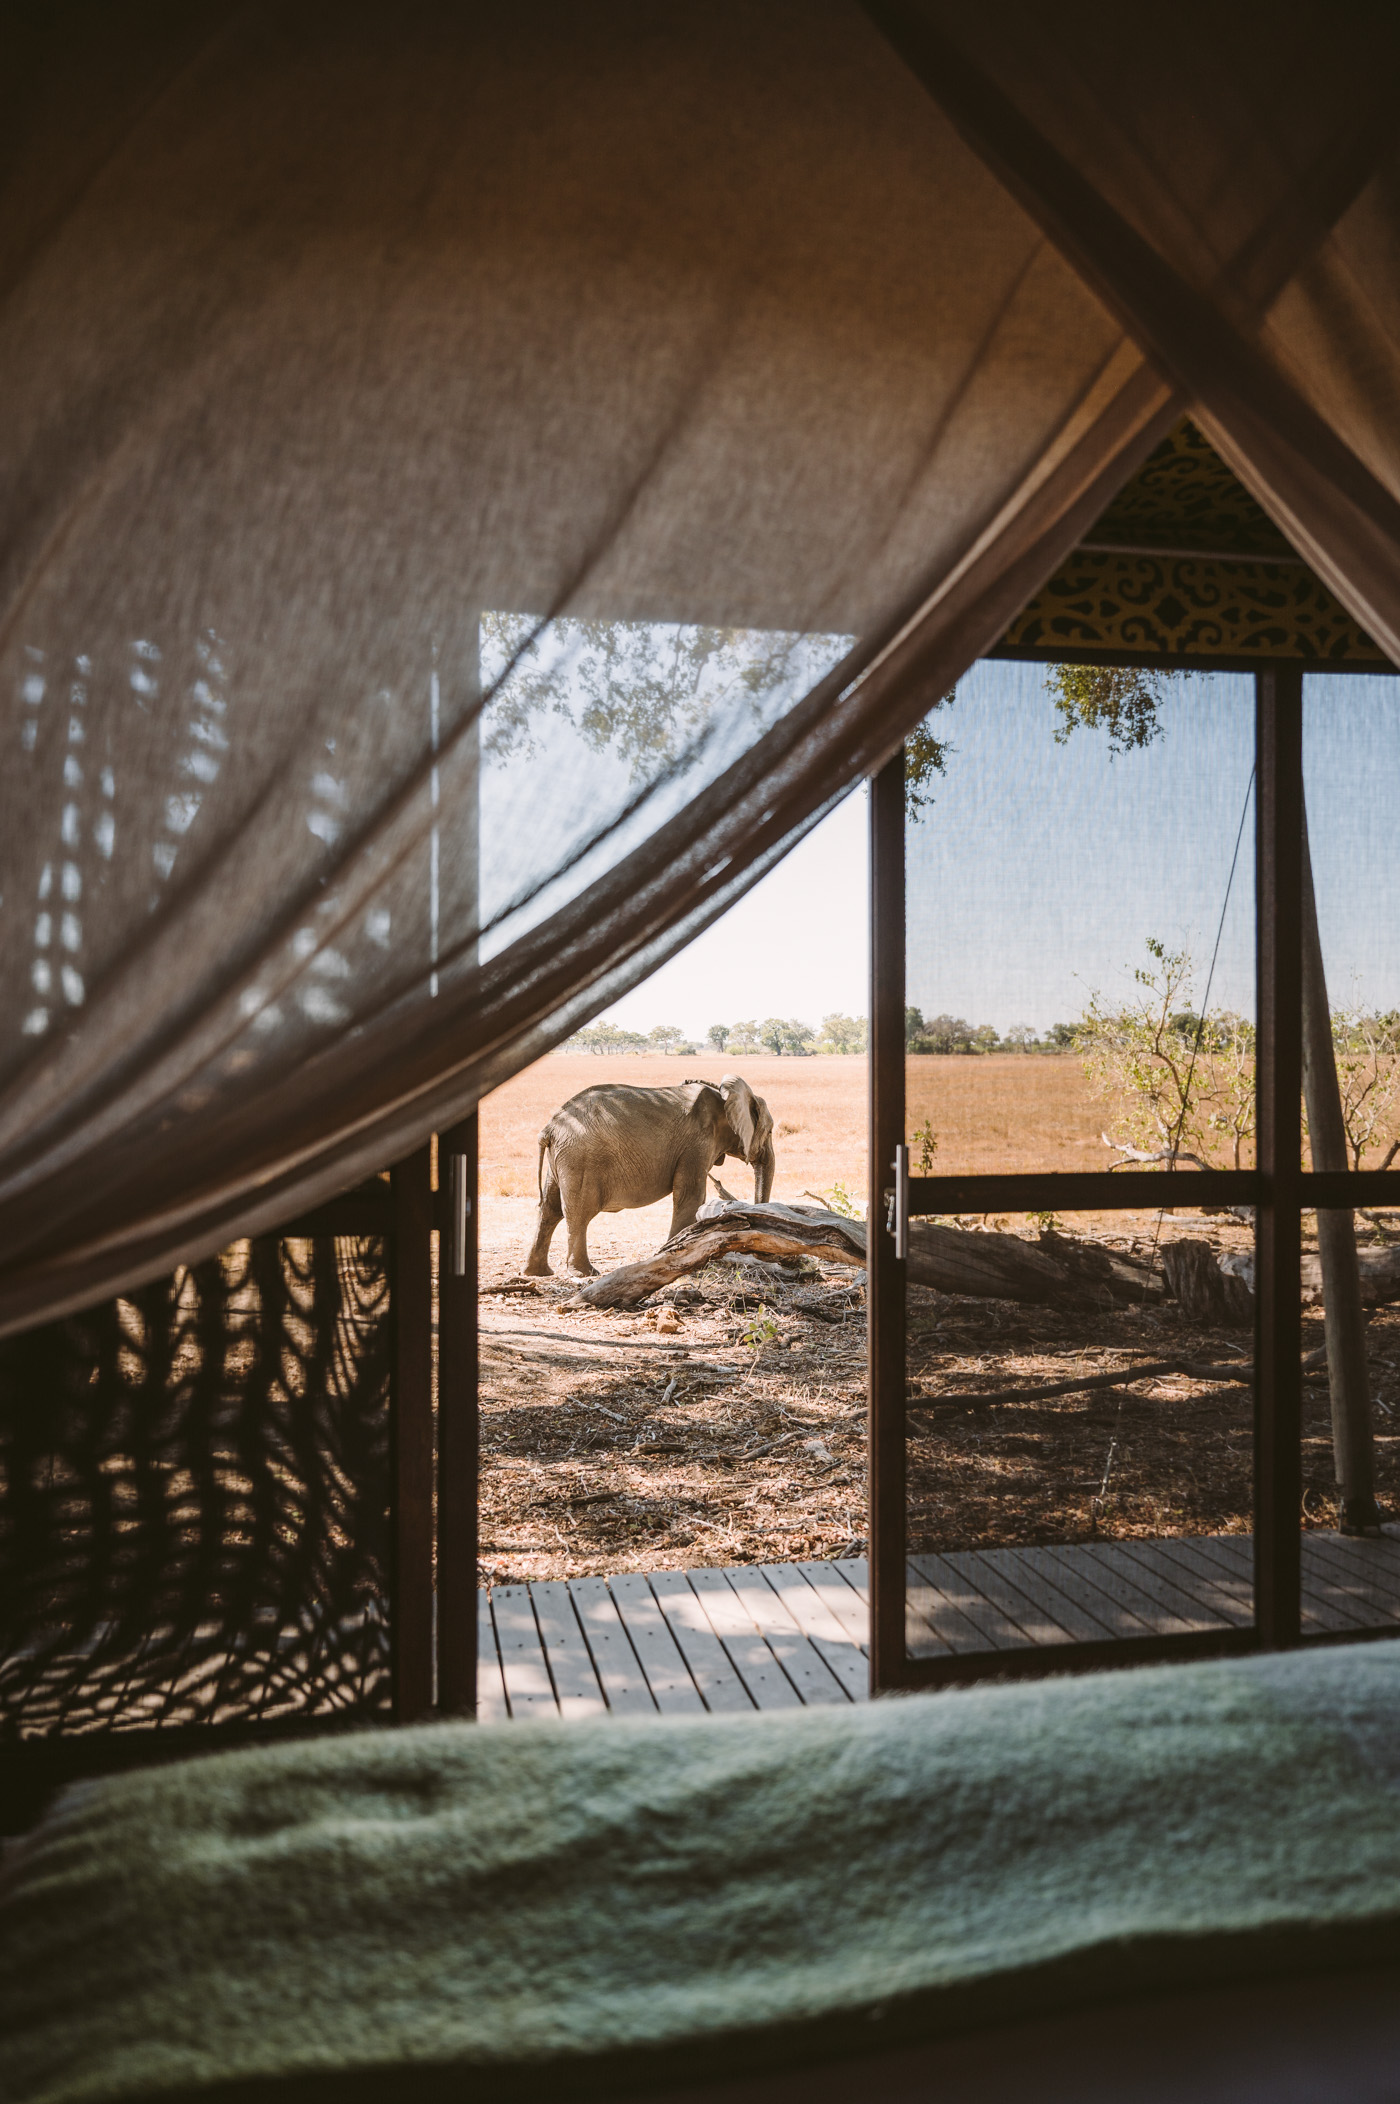 andBeyond Xaranna Okavango Delta Botswana